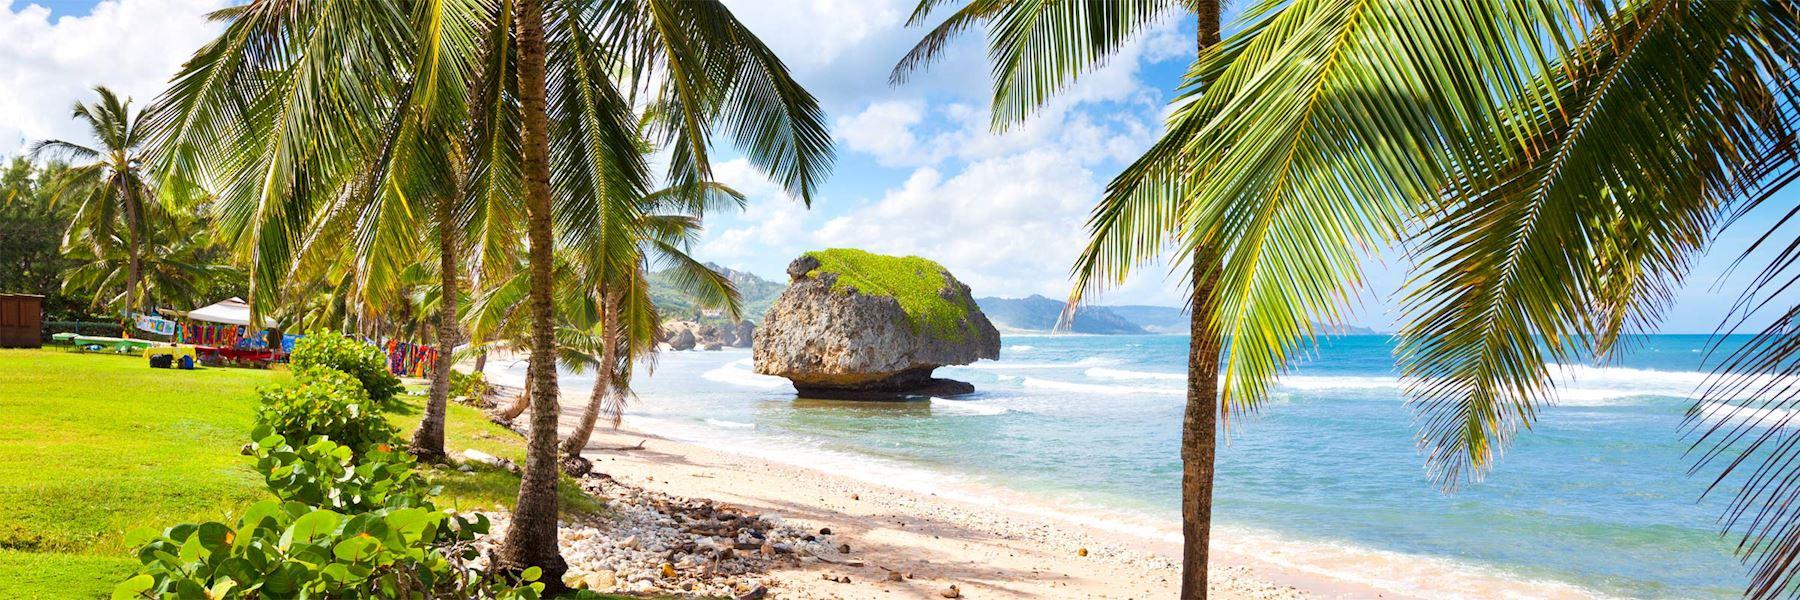 Barbados holidays  2019 & 2020